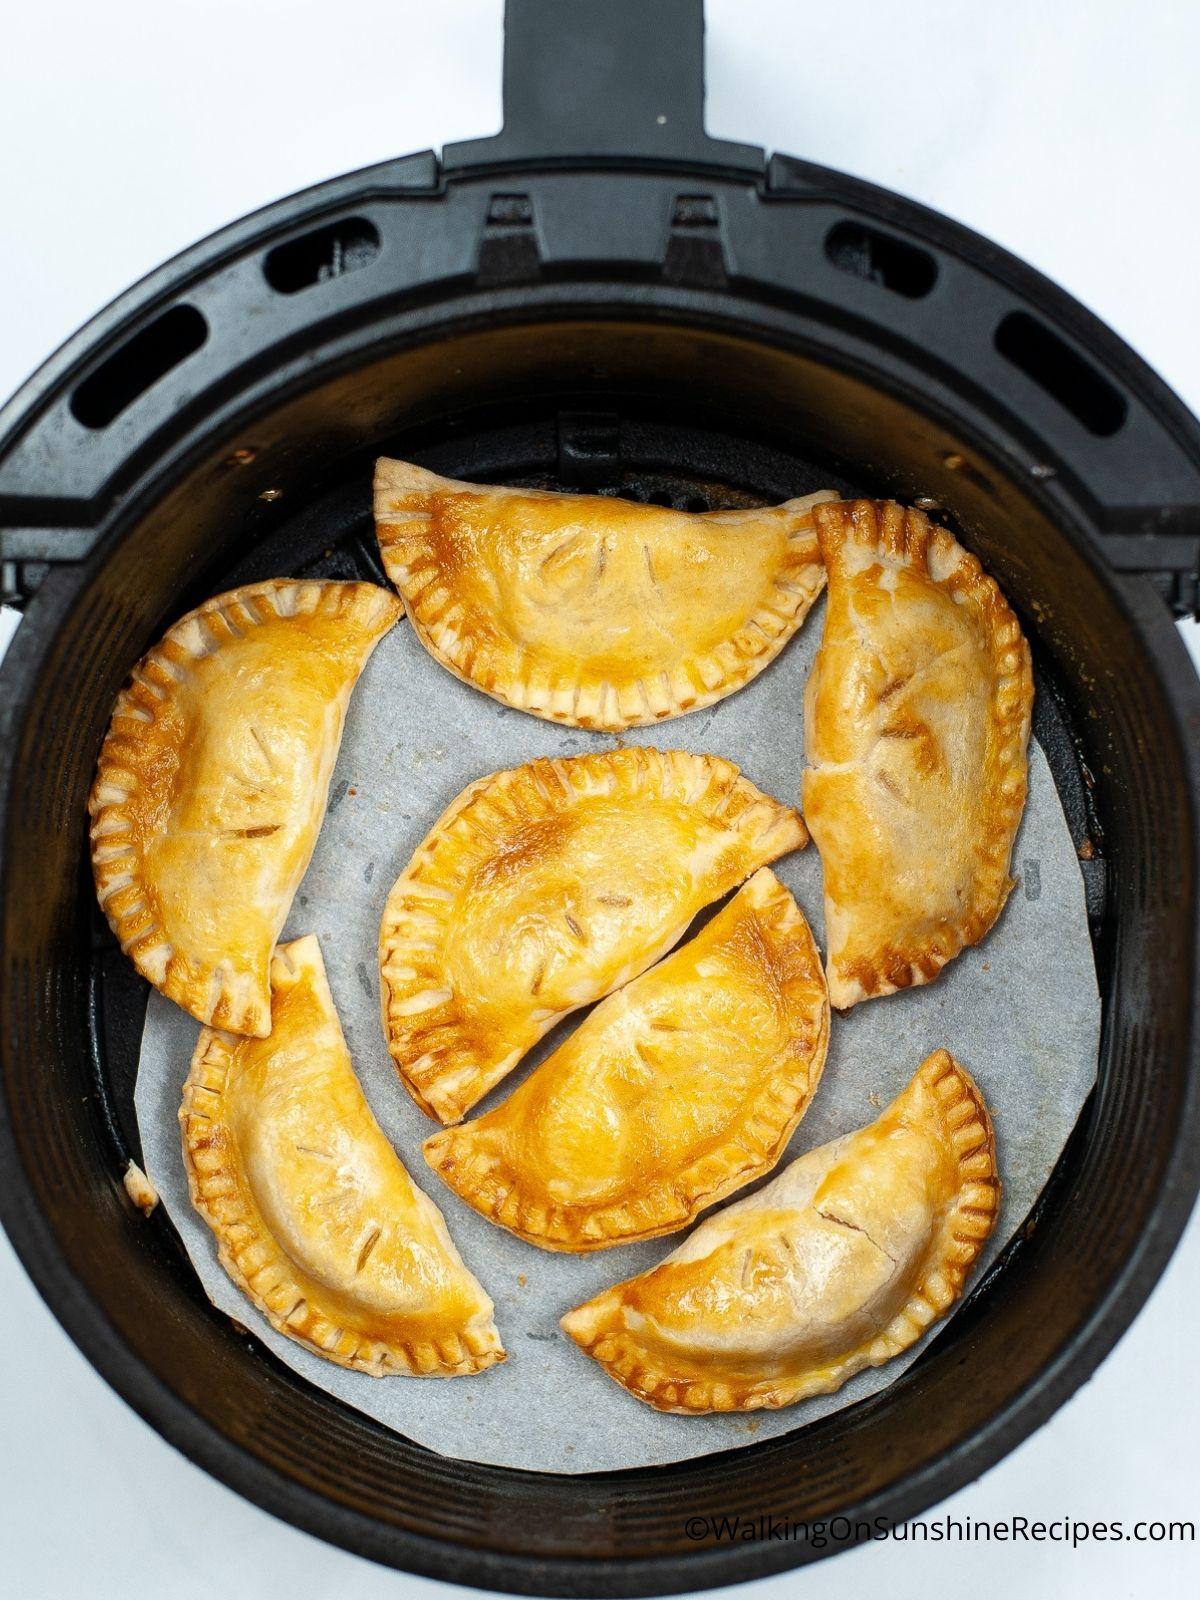 Baked Apple Hand Pies in Air Fryer.